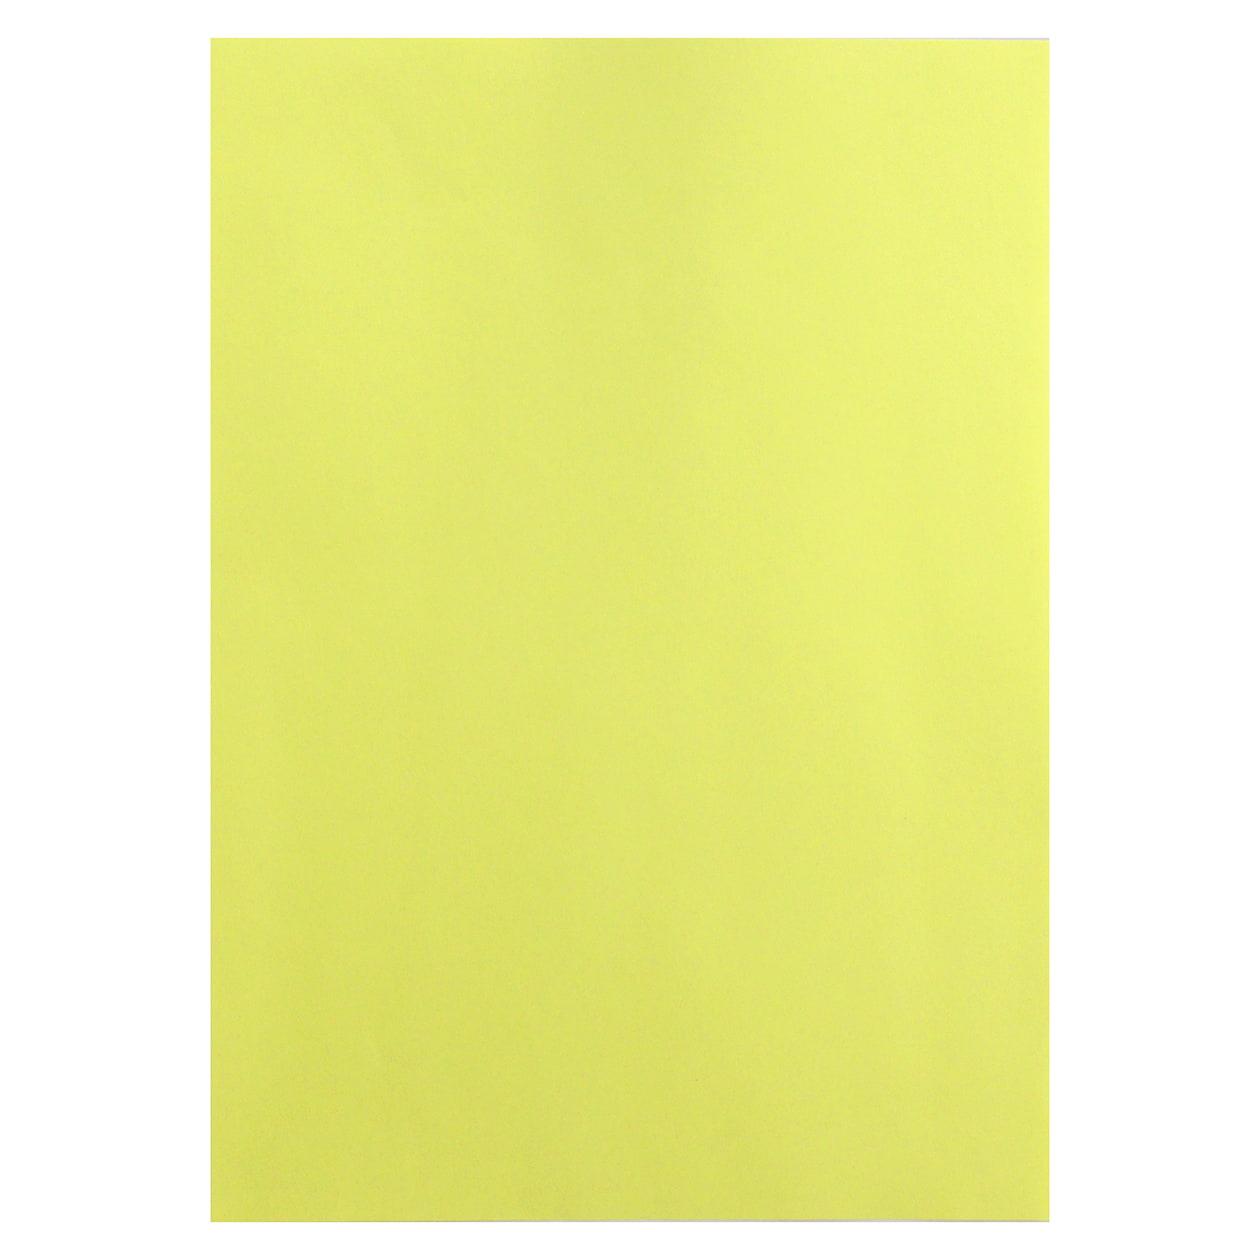 A4シート 上質カラー グリーン 90.7g